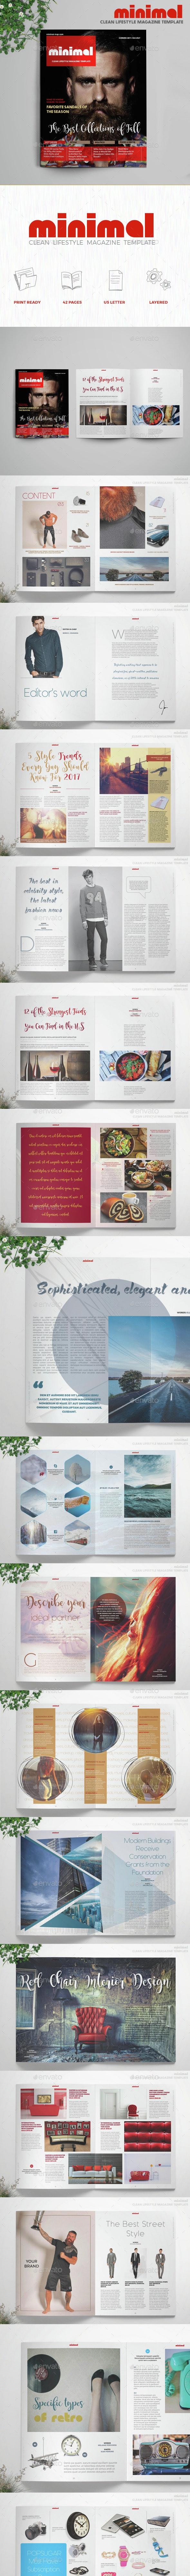 Minimal - Lifestyle Magazine - Magazines Print Templates